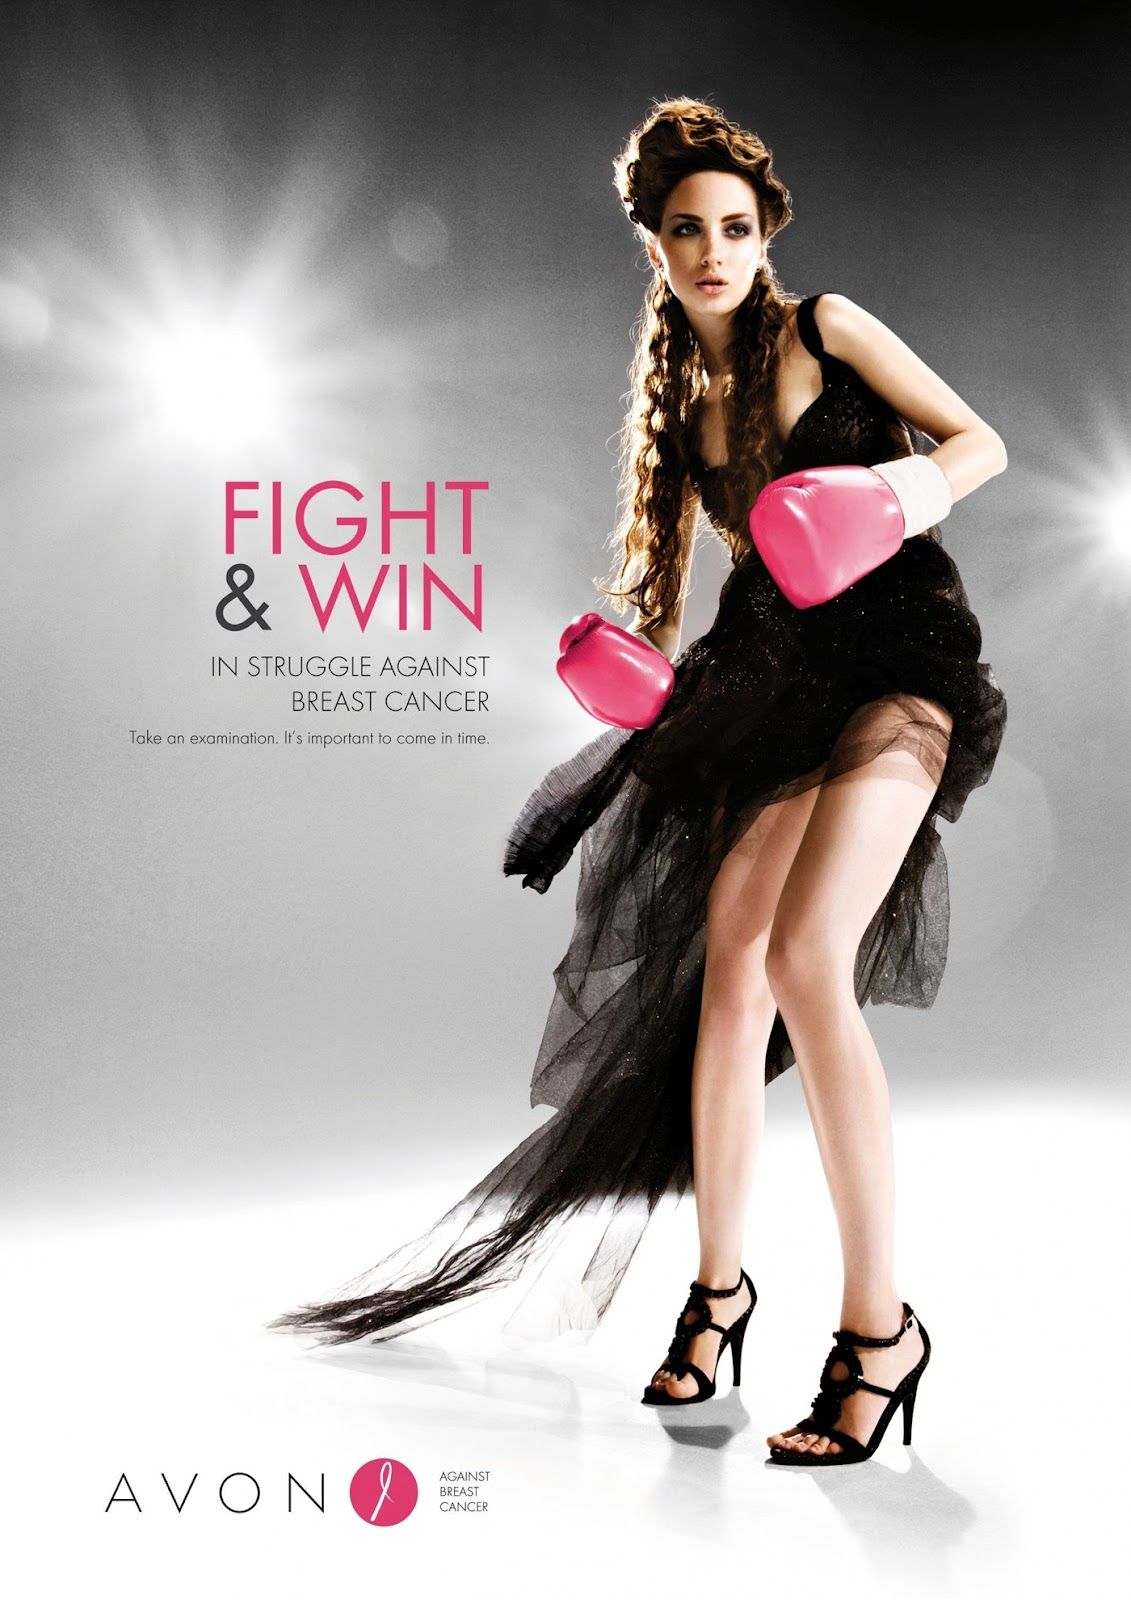 http://1.bp.blogspot.com/-aPU8h1K4fjg/T5WLMPxlA_I/AAAAAAAABgc/sdcuh5cYOEI/s1600/breast+cancer8.jpg